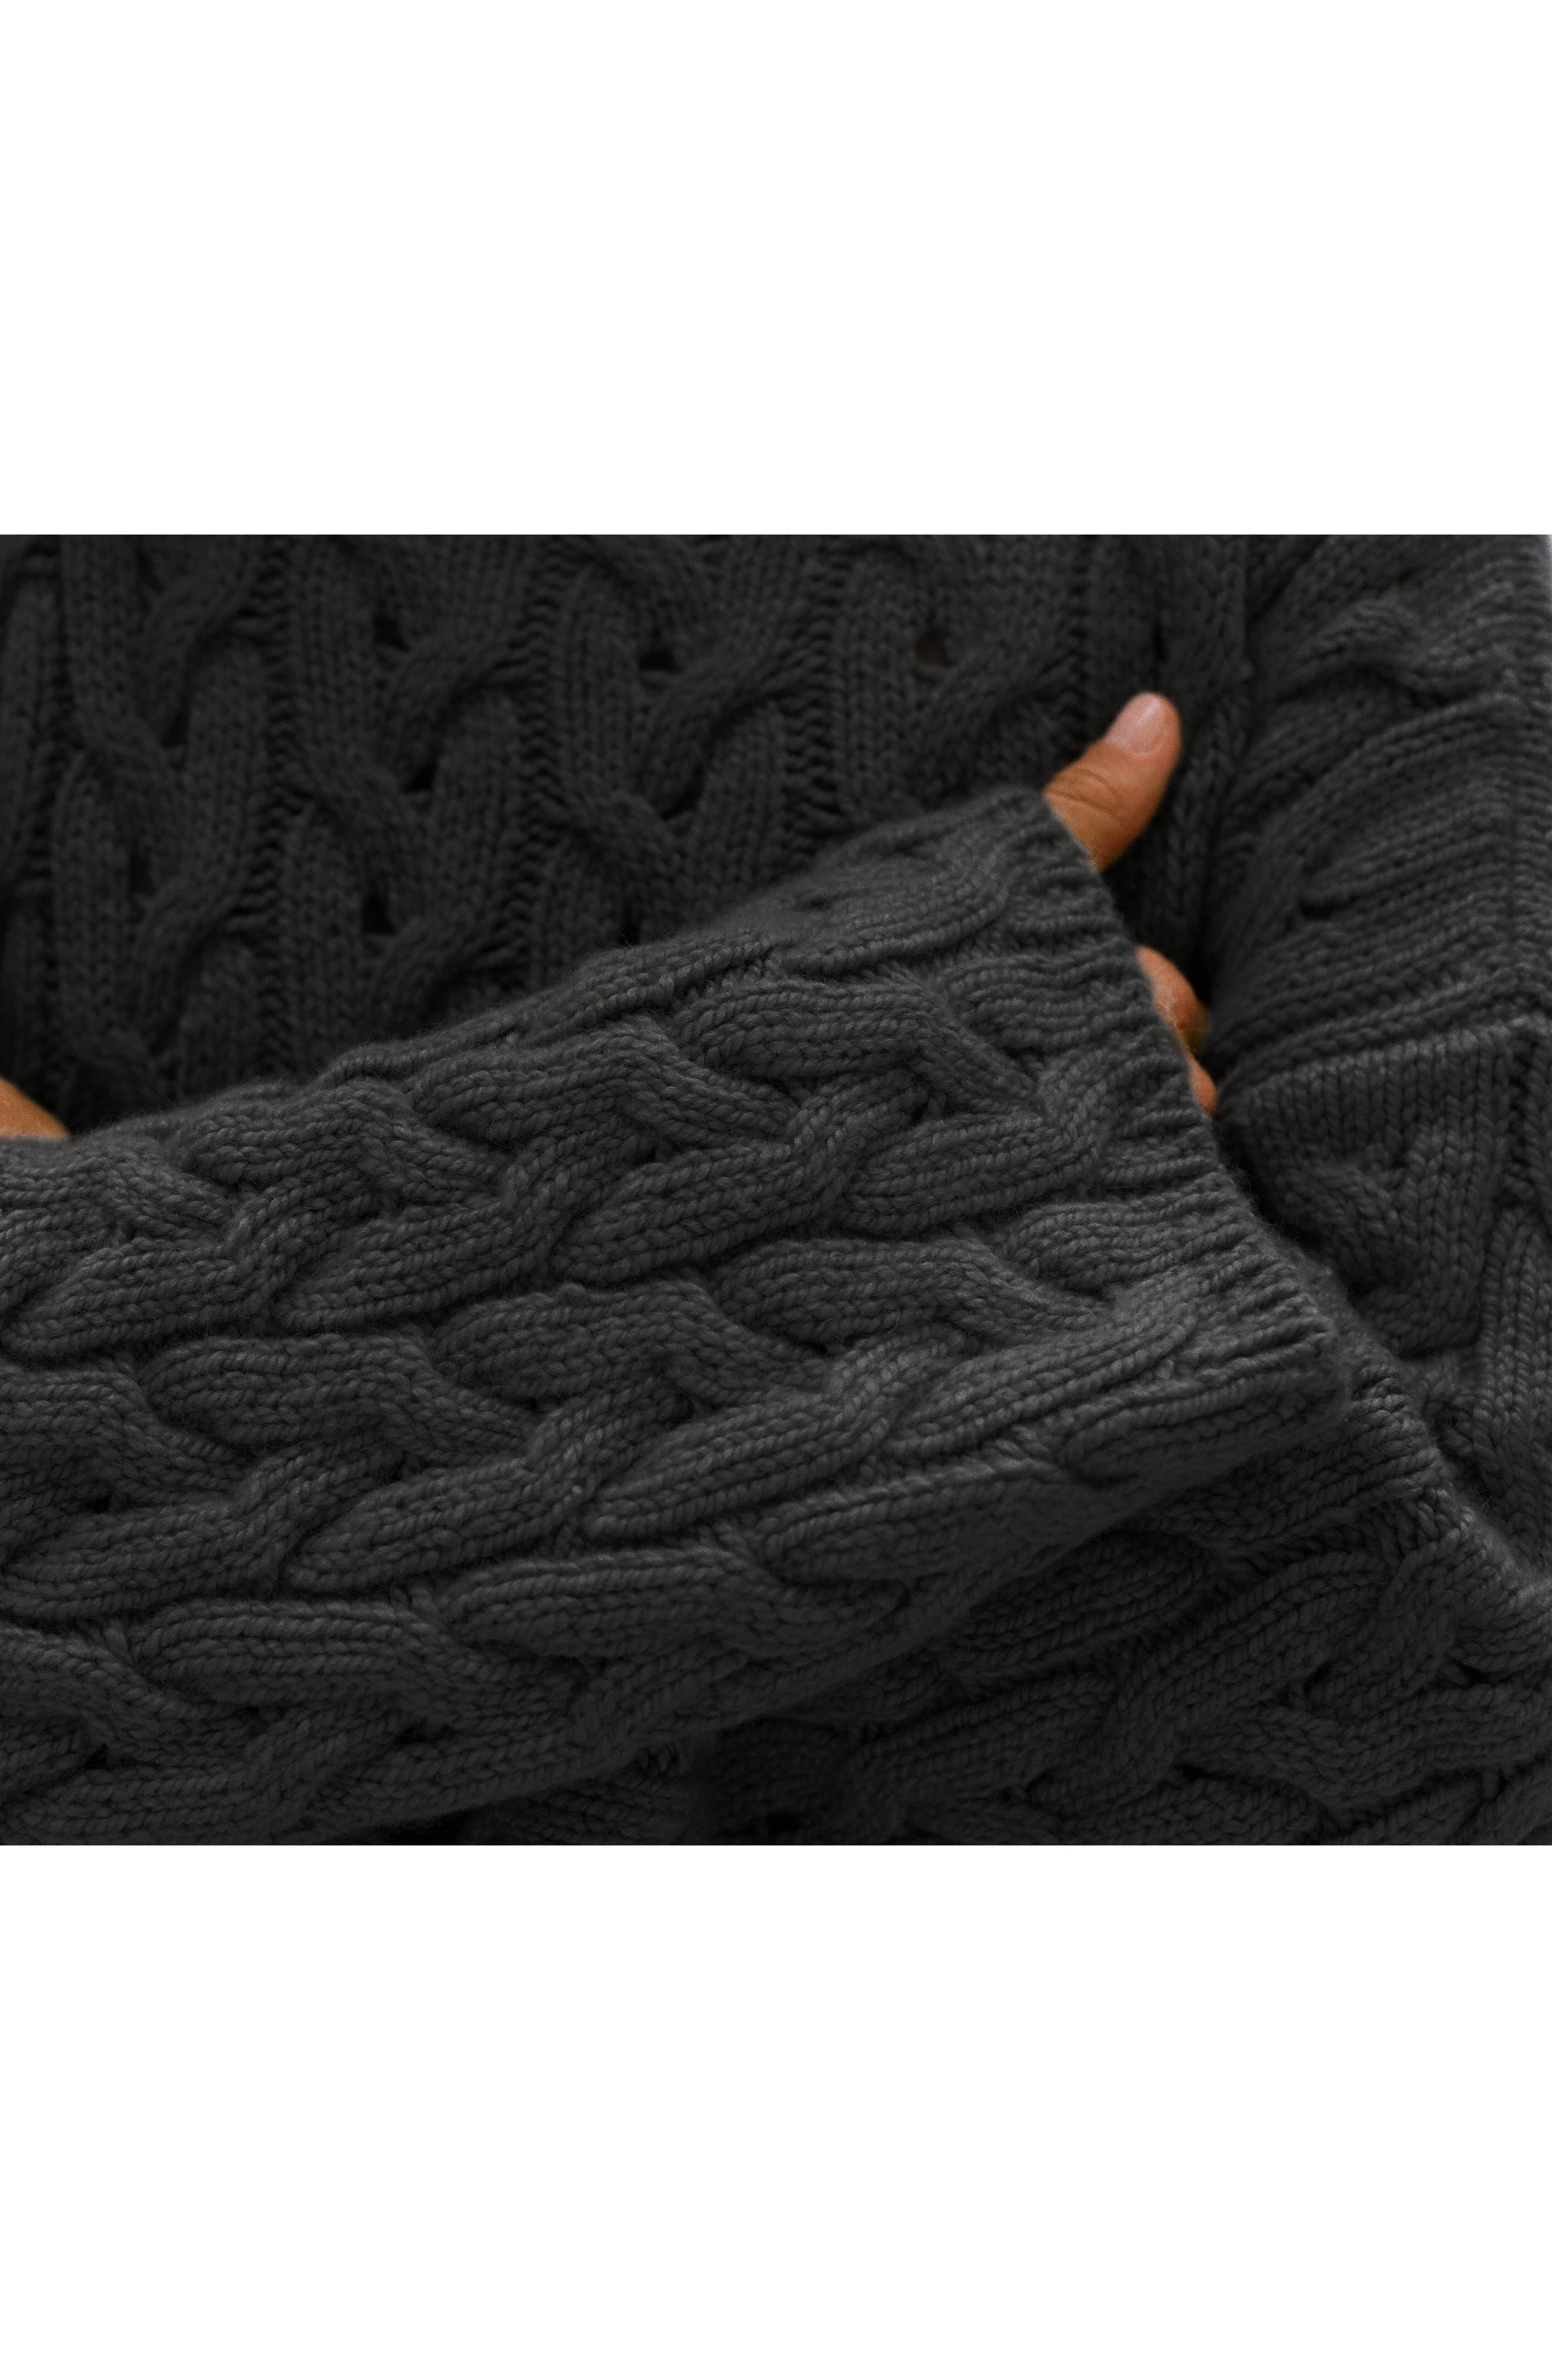 Oversized Braided Cashmere Sweater,                             Alternate thumbnail 8, color,                             DARK GREY